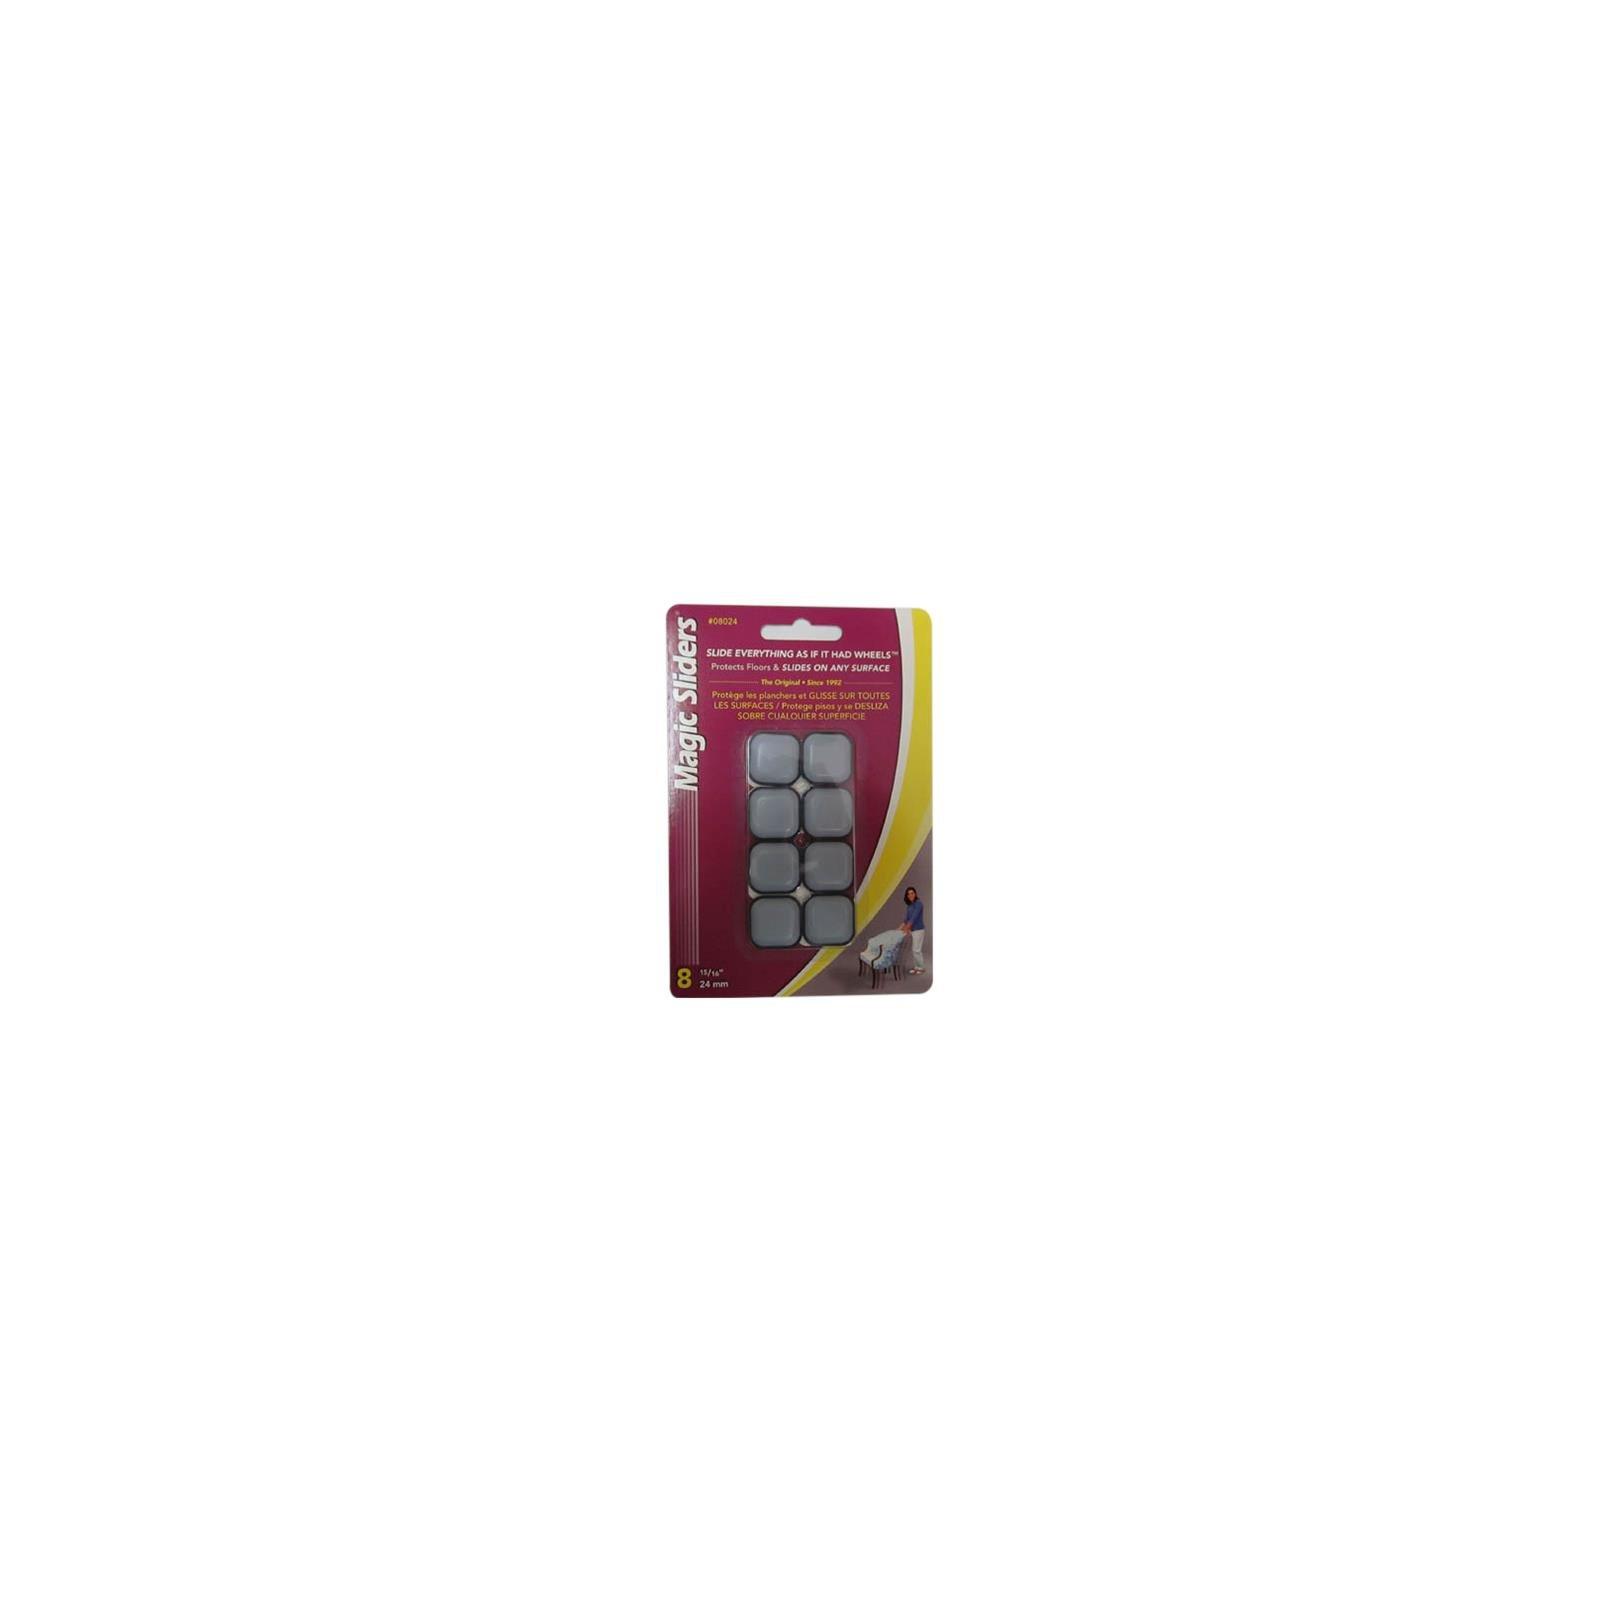 Magic Sliders L P 08024 Surface Protectors, Furniture Sliding Discs, Adhesive, 15/16-In. Square, 8-Pk. - Quantity 5